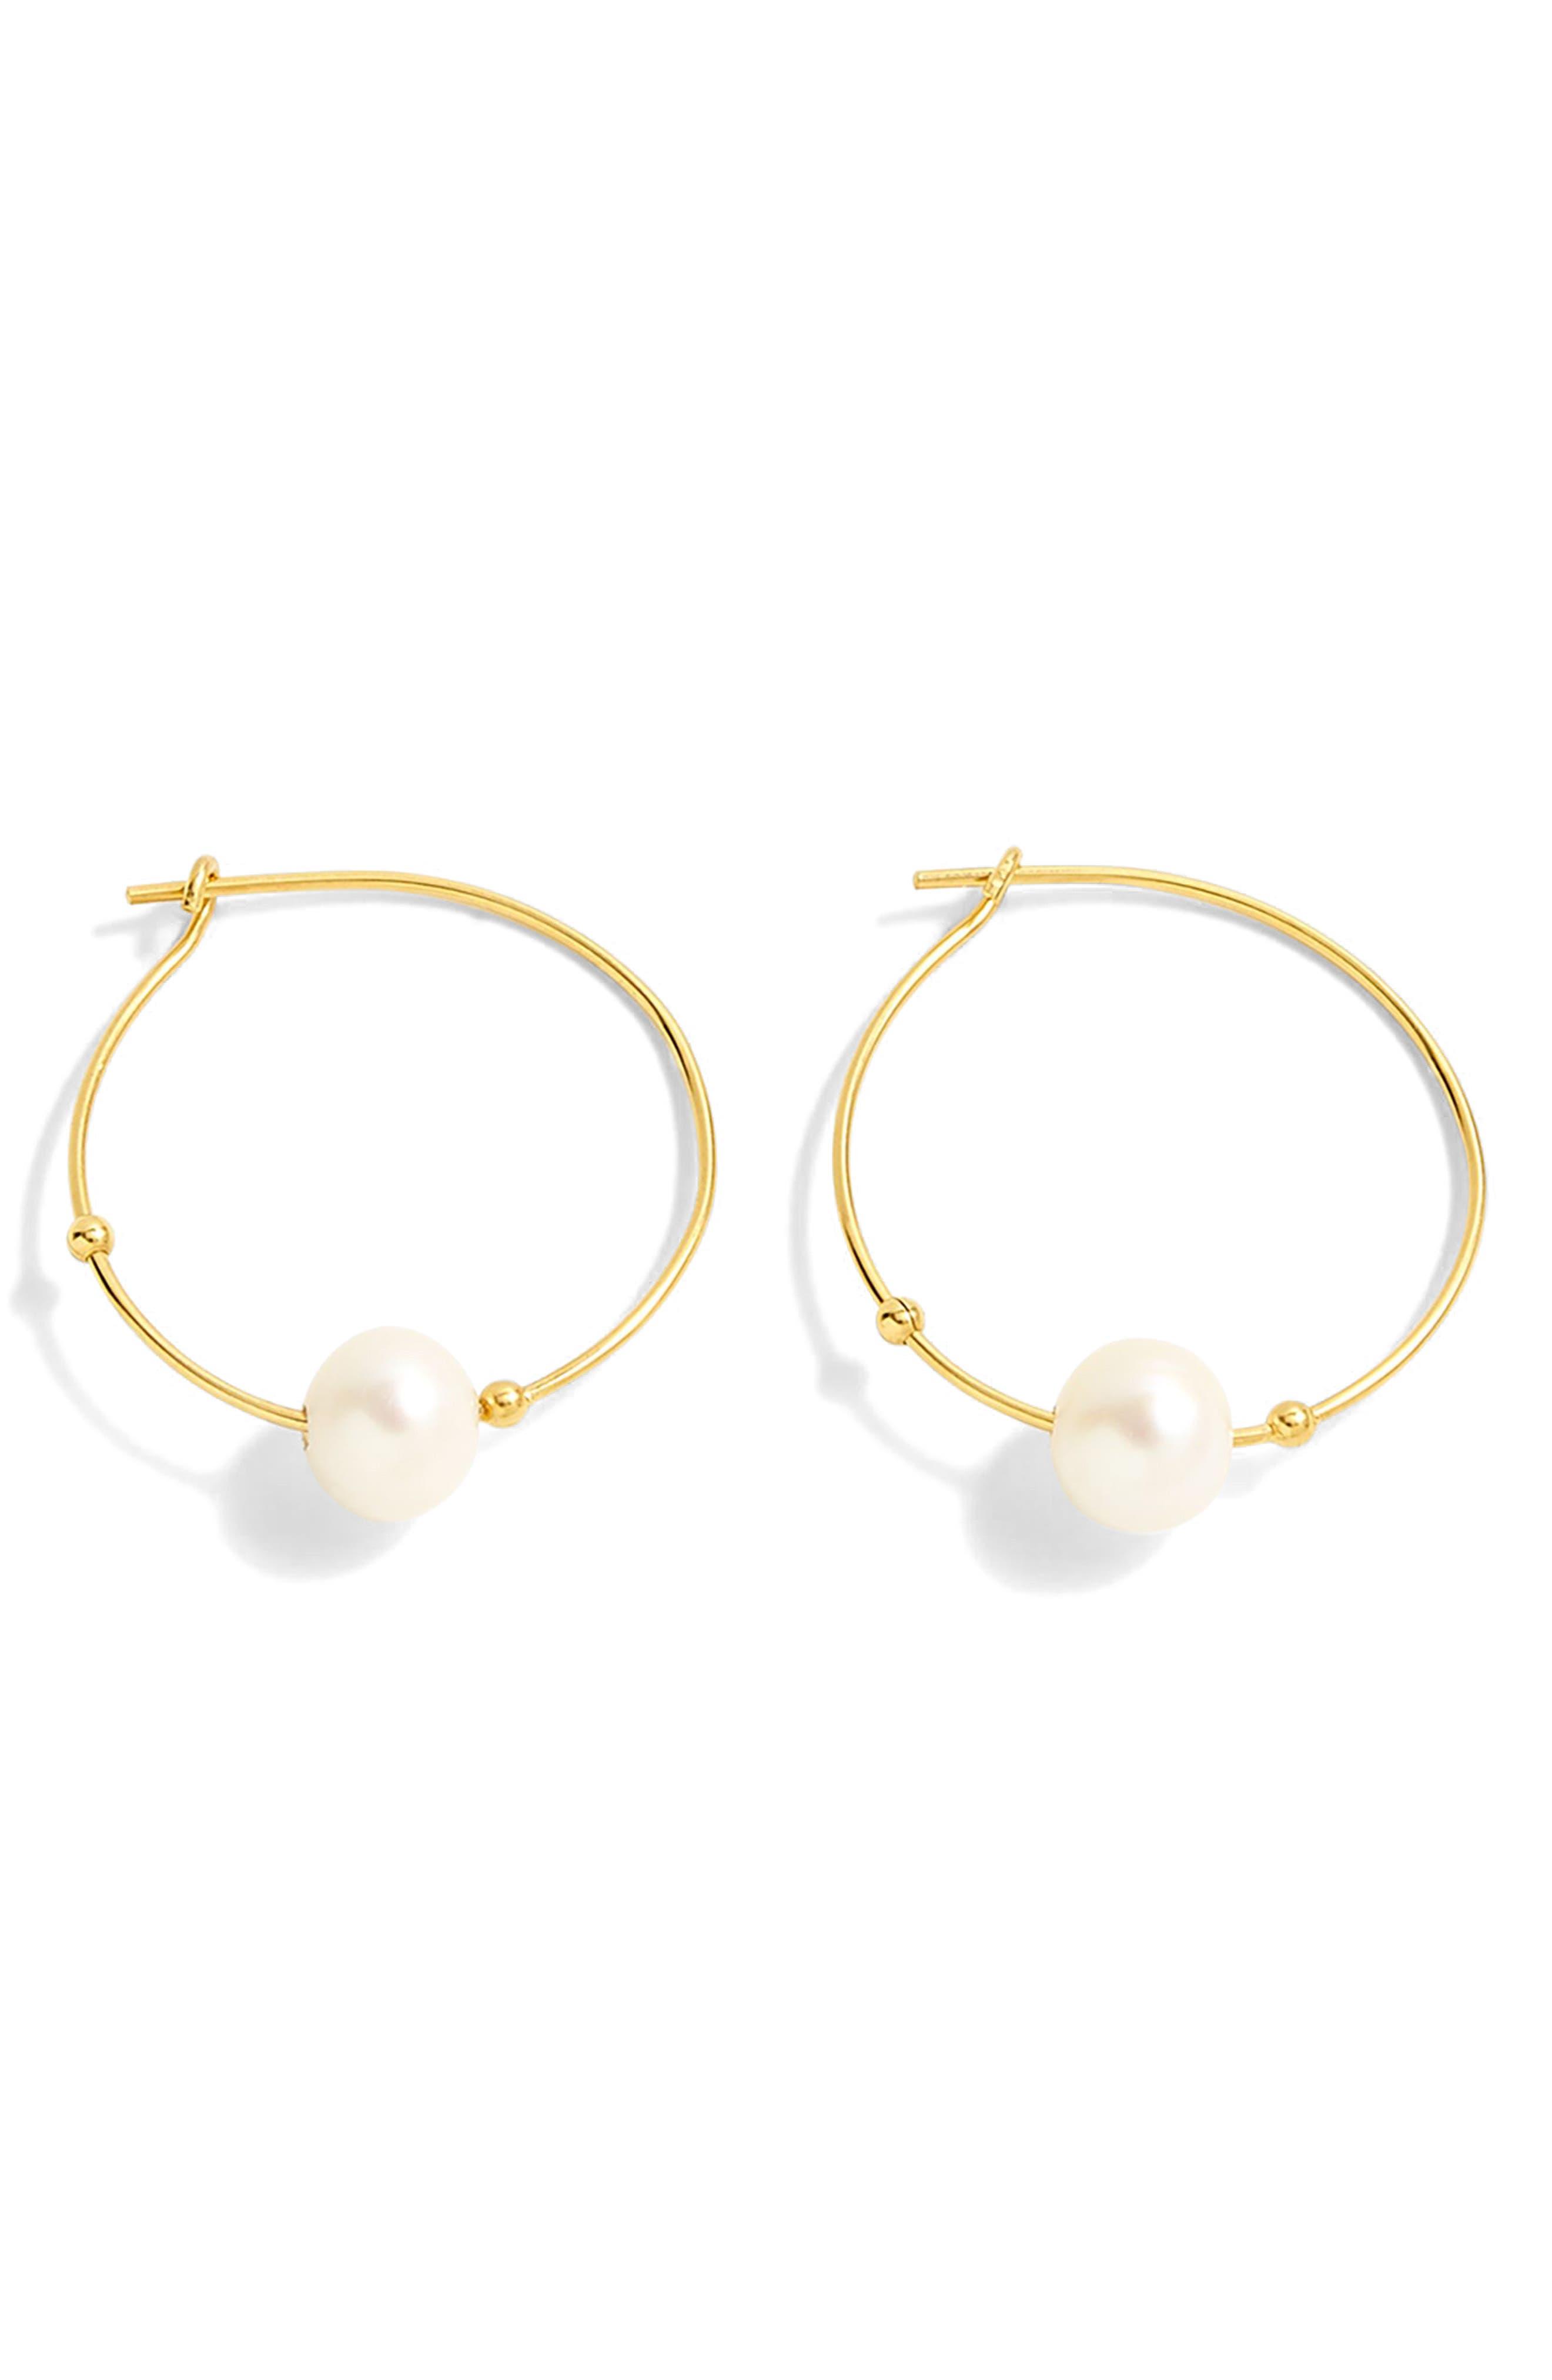 J.Crew Single Pearl Hoop Earrings,                             Main thumbnail 1, color,                             Gold